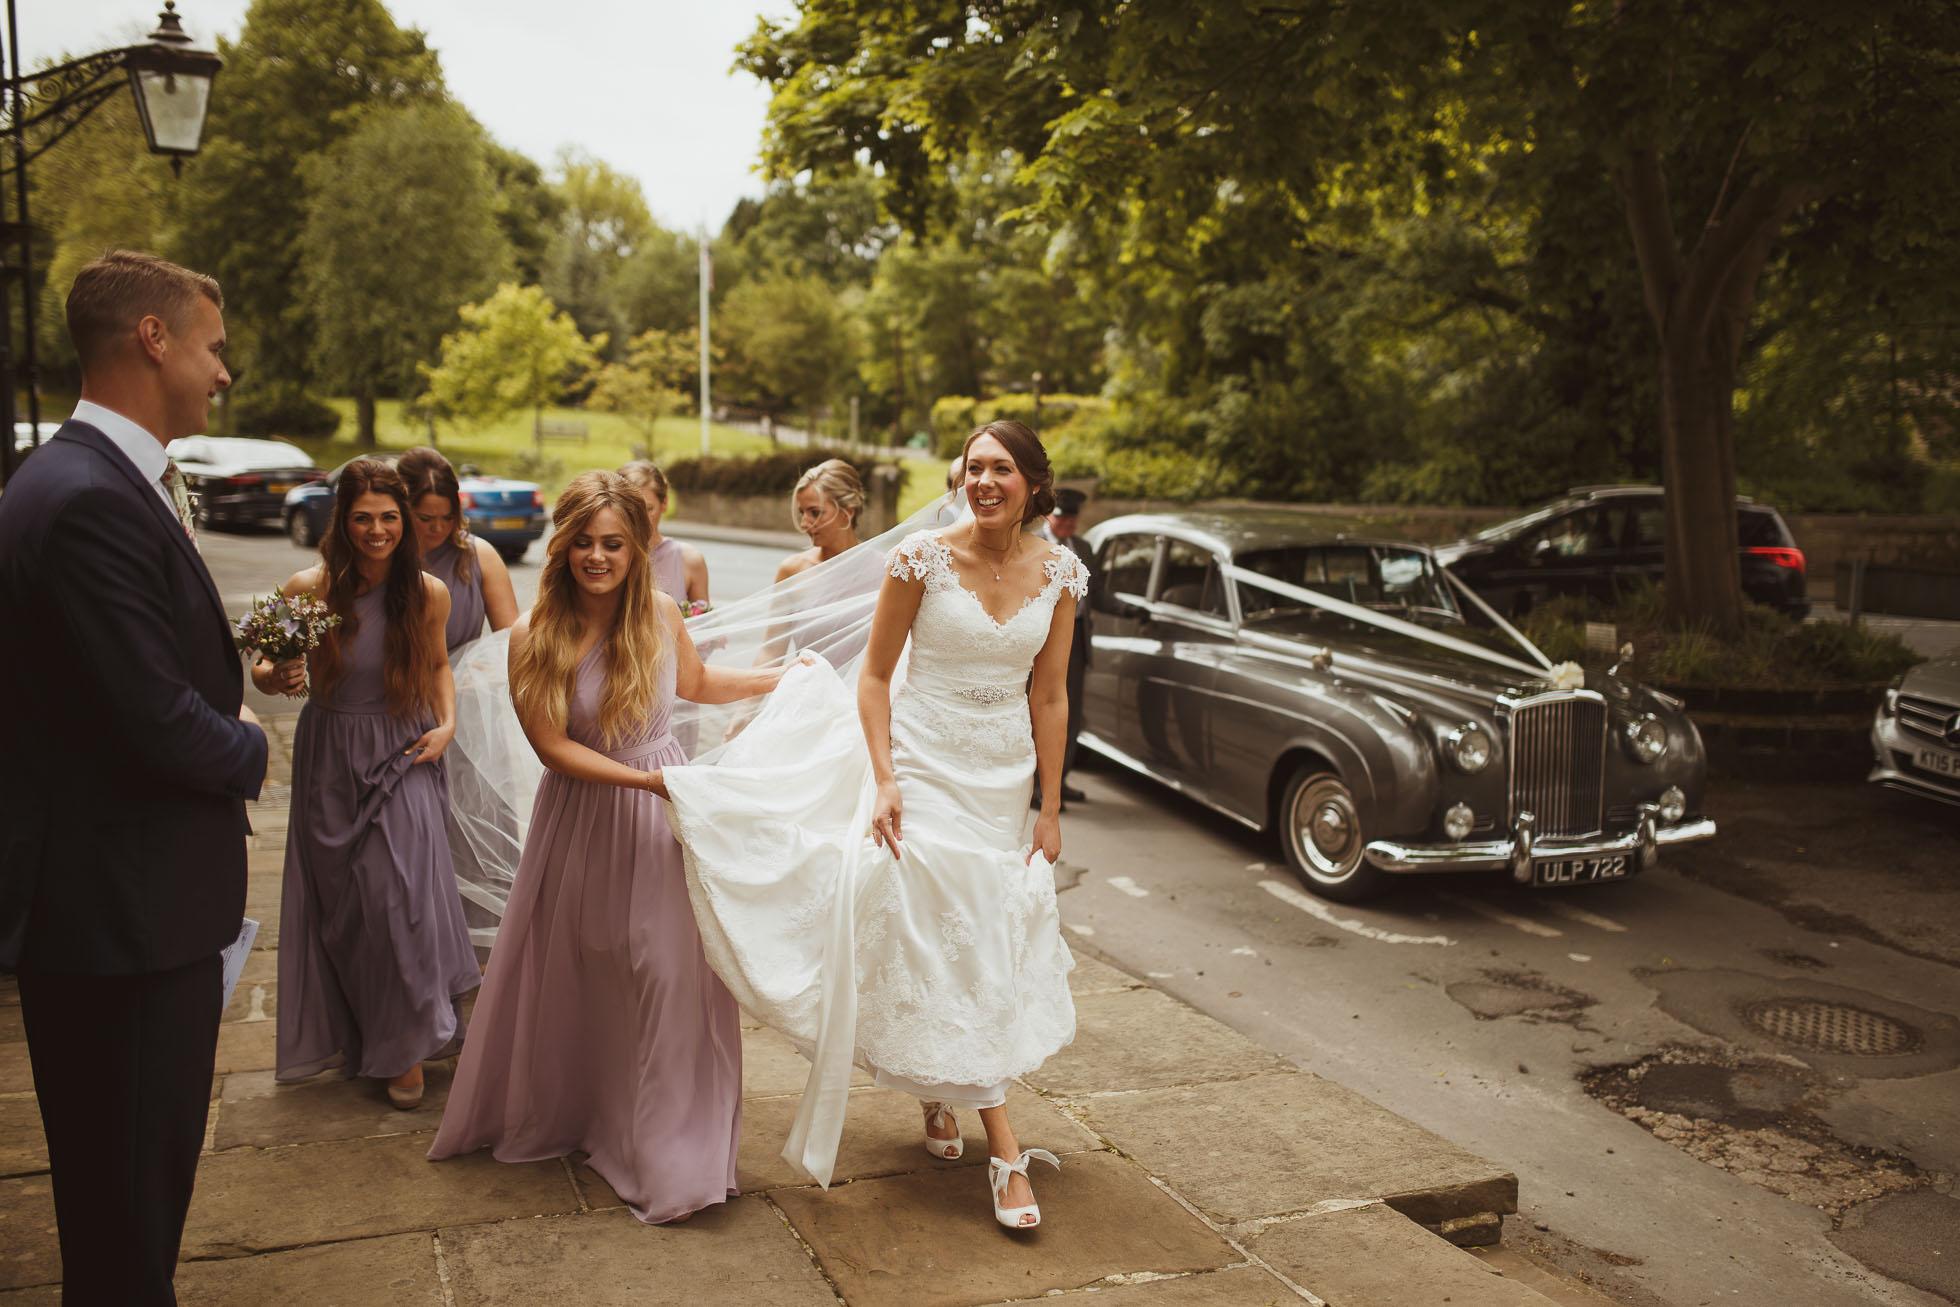 denton-hall-wedding-photographer-26.jpg